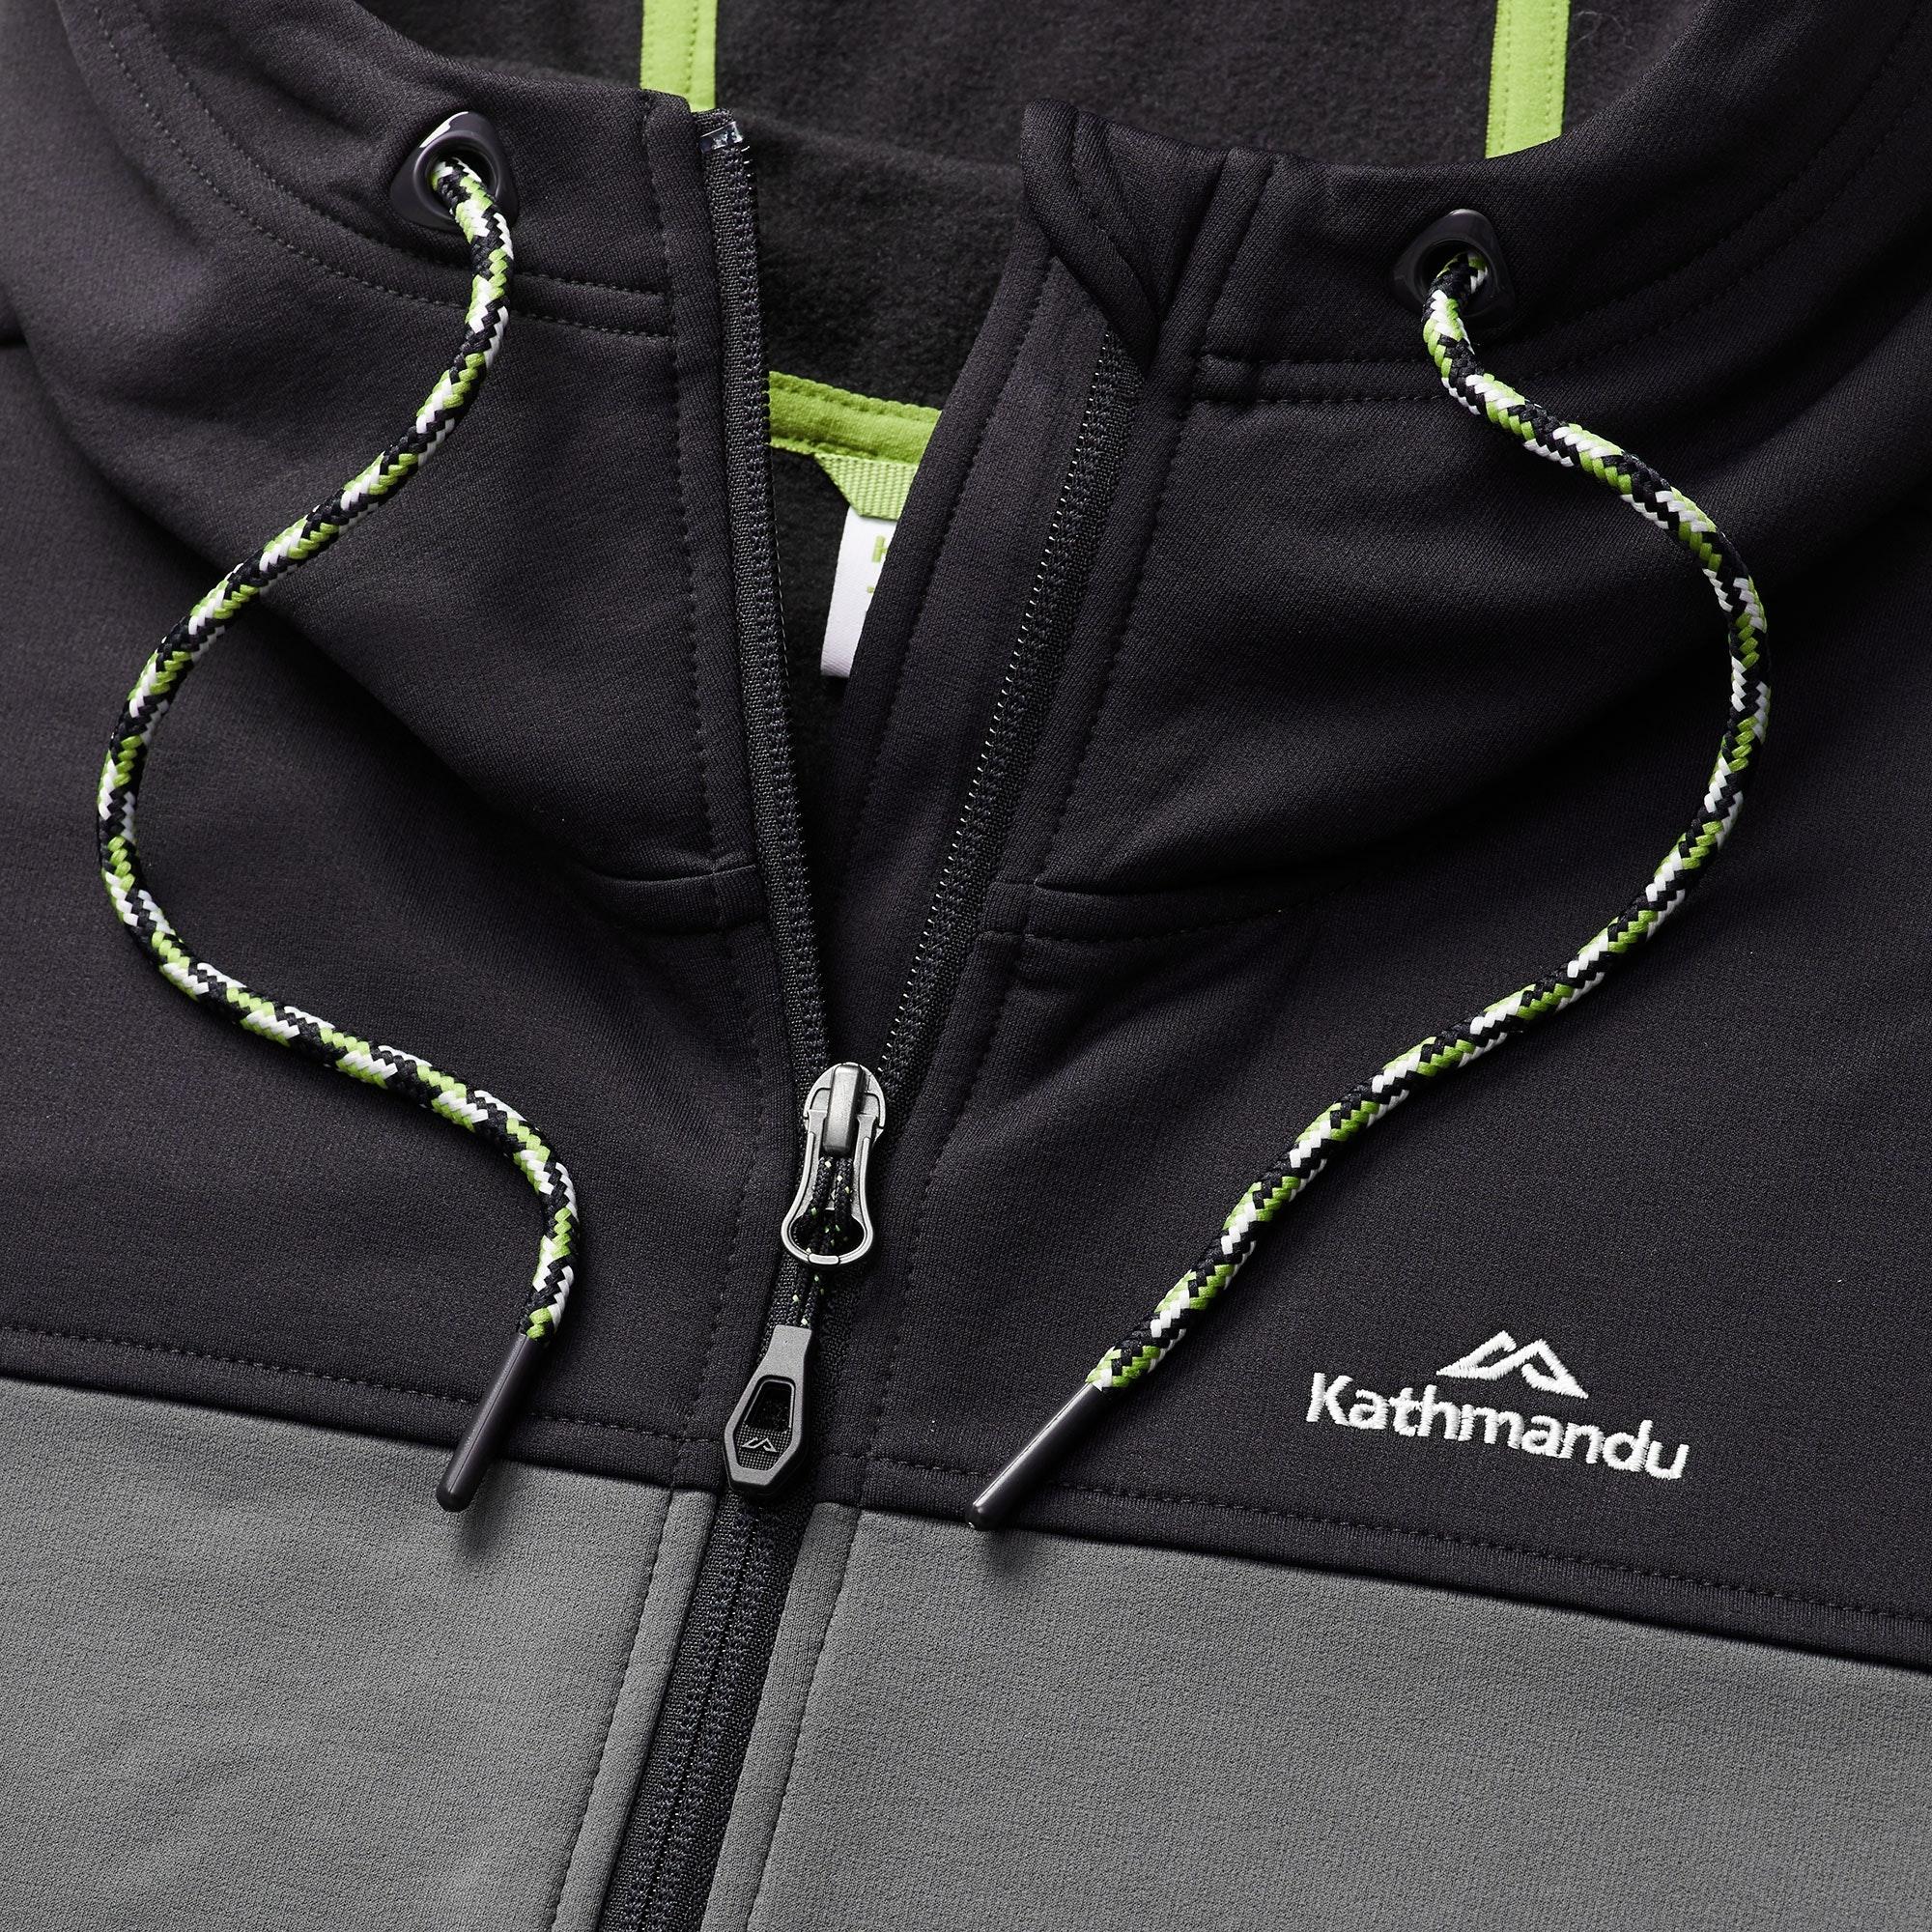 NEW-Kathmandu-Tarras-Mens-Full-Zip-Warm-Hooded-Outdoor-Walking-Jacket-Top